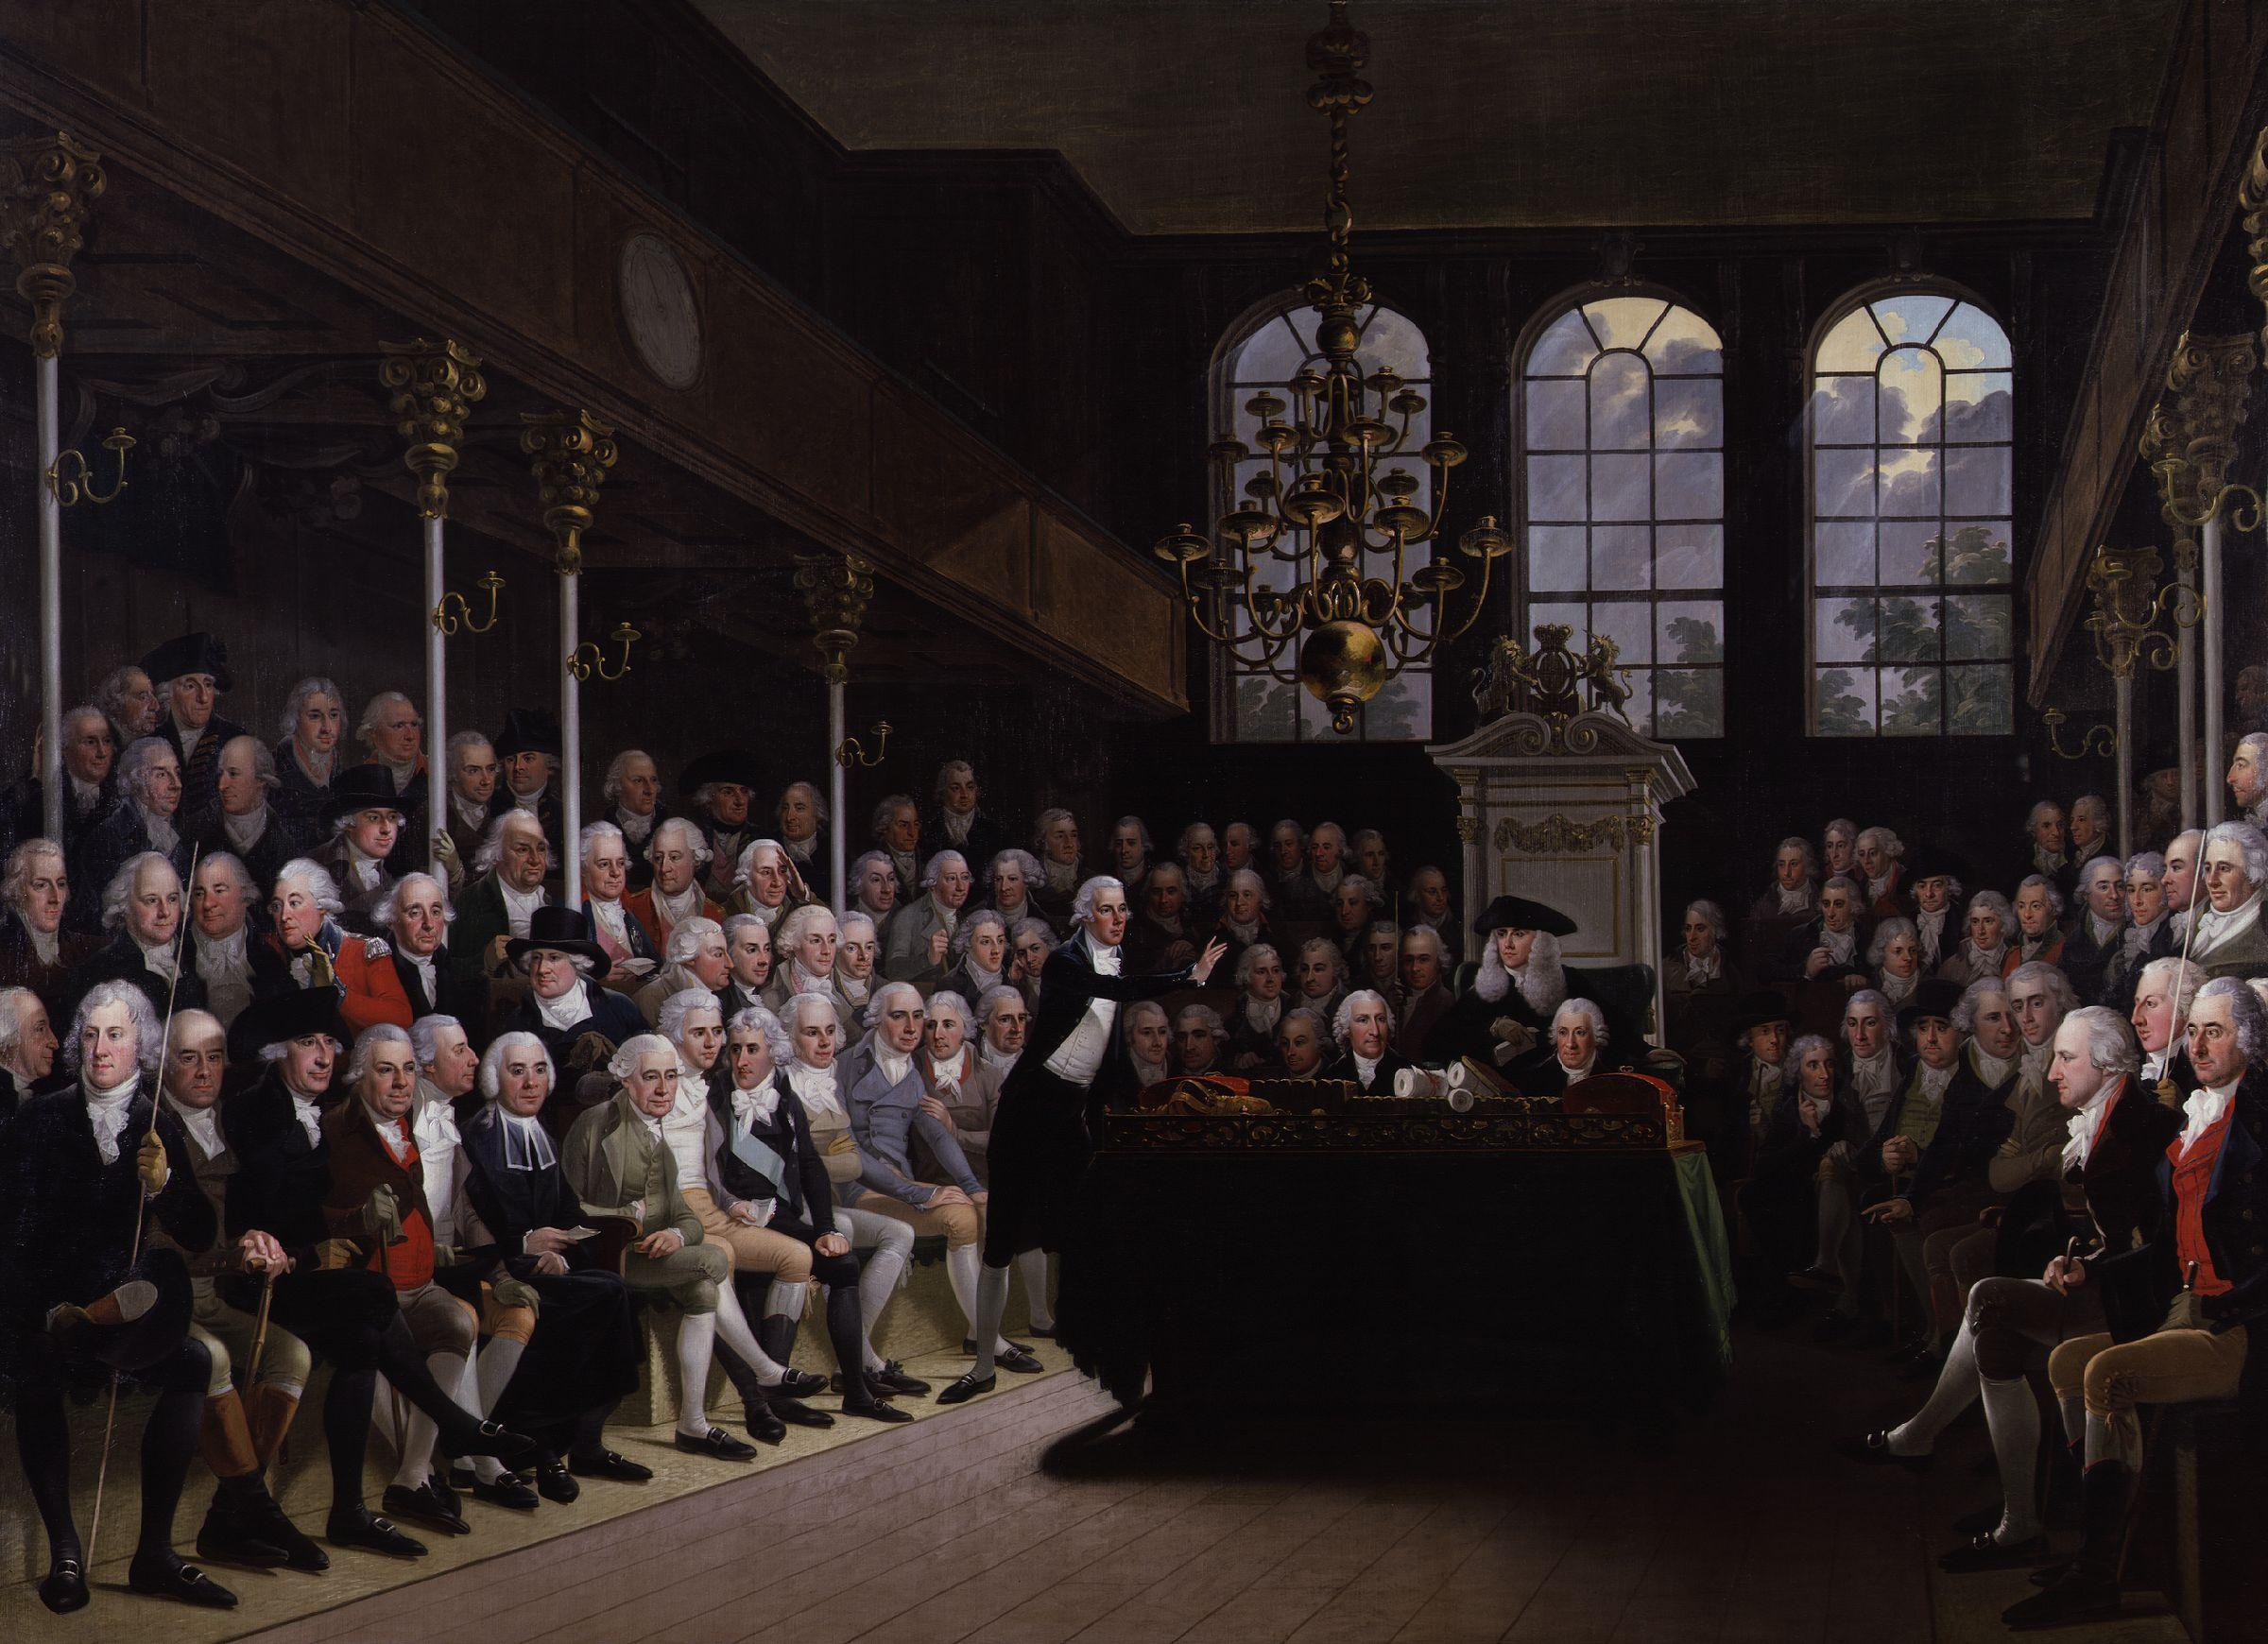 Le radici moderne della rappresentanza: Hobbes e Rousseau